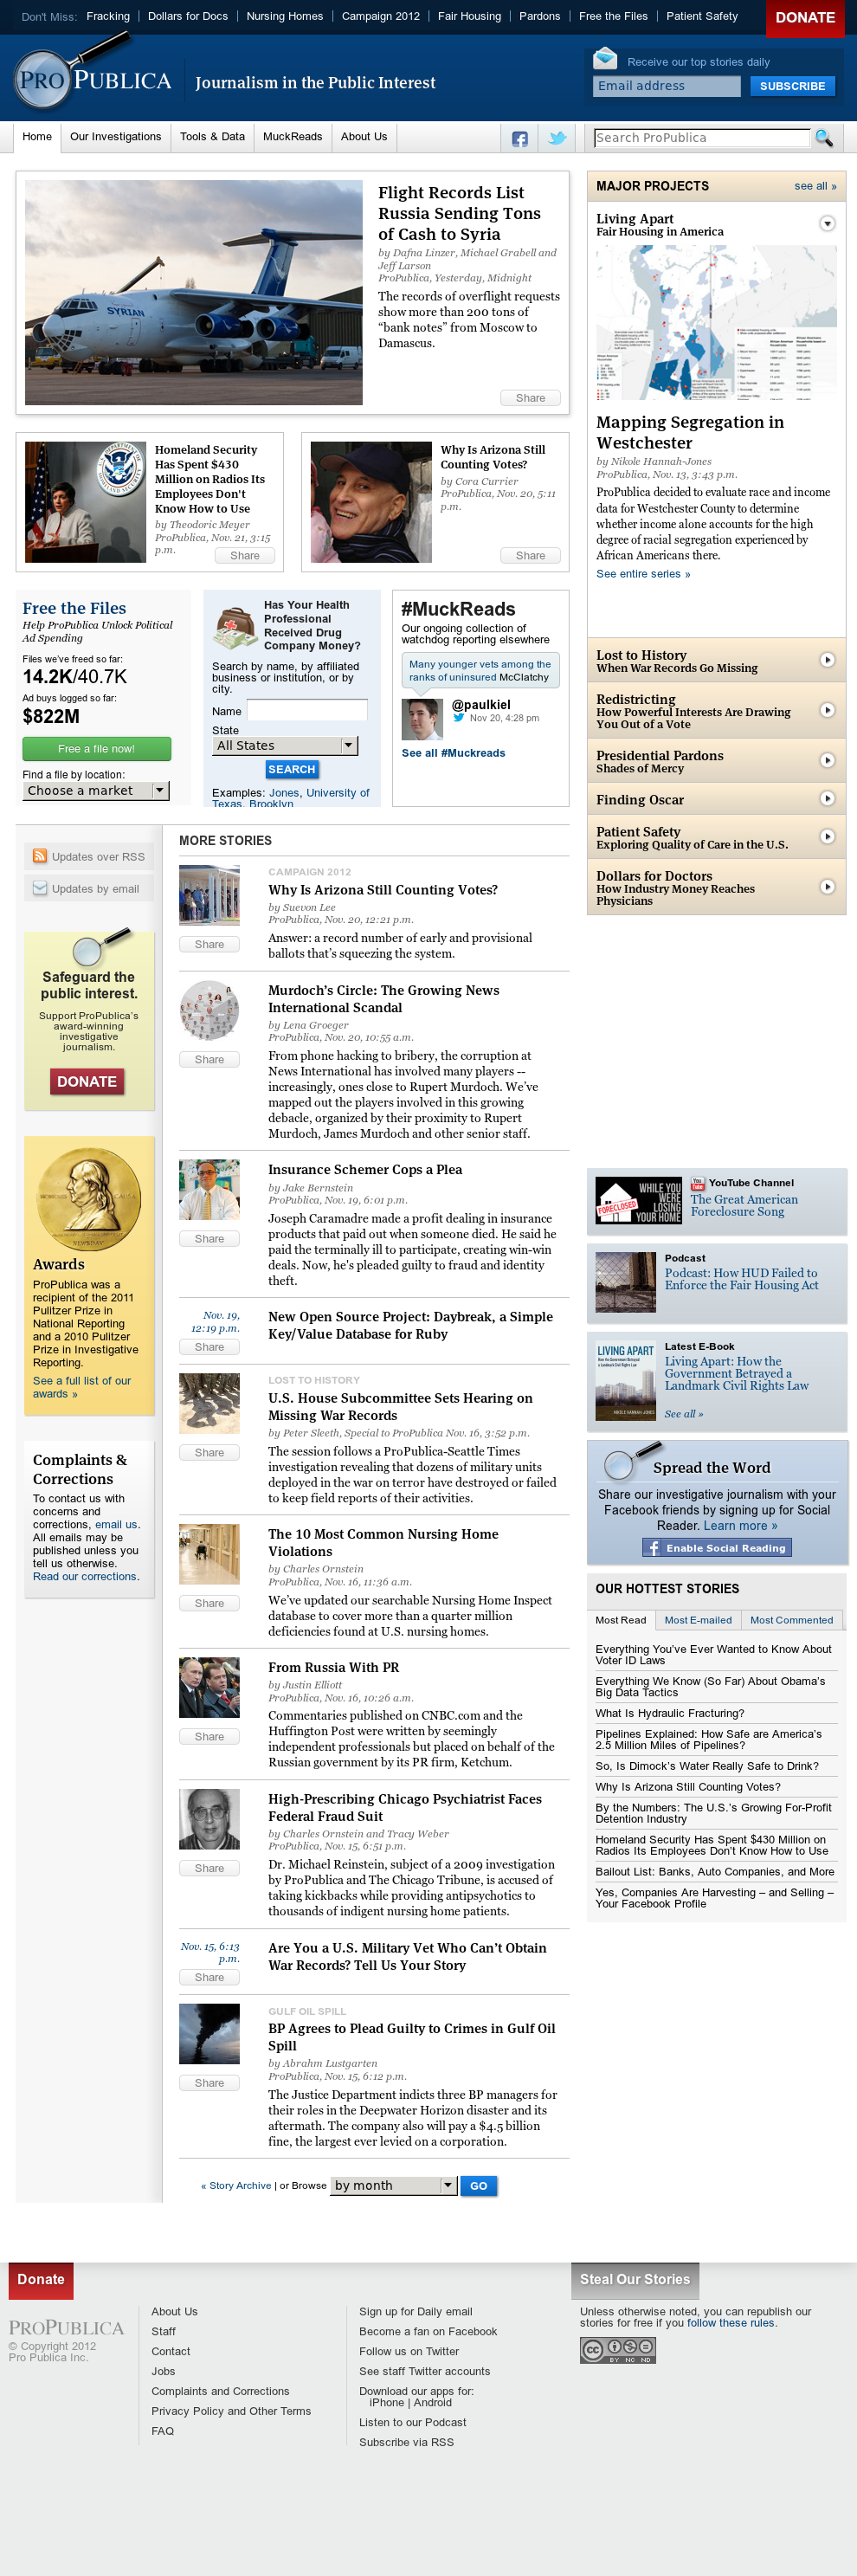 ProPublica at Monday Nov. 26, 2012, 6:22 a.m. UTC